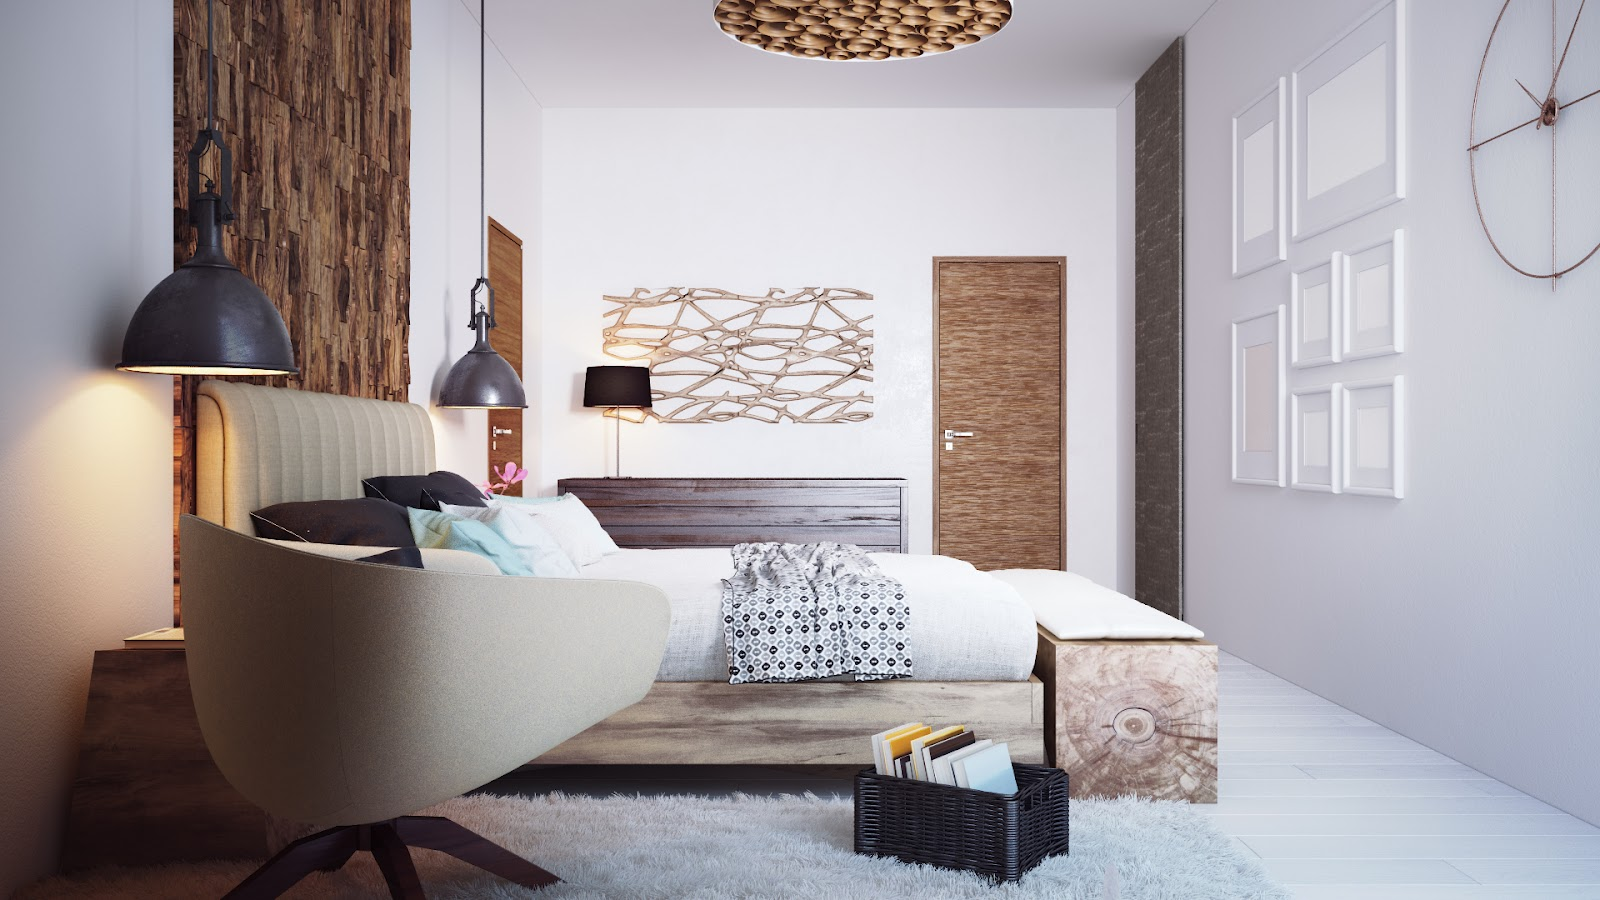 Cozy minimalist bedroom by Alexander Uglyanitsa 4